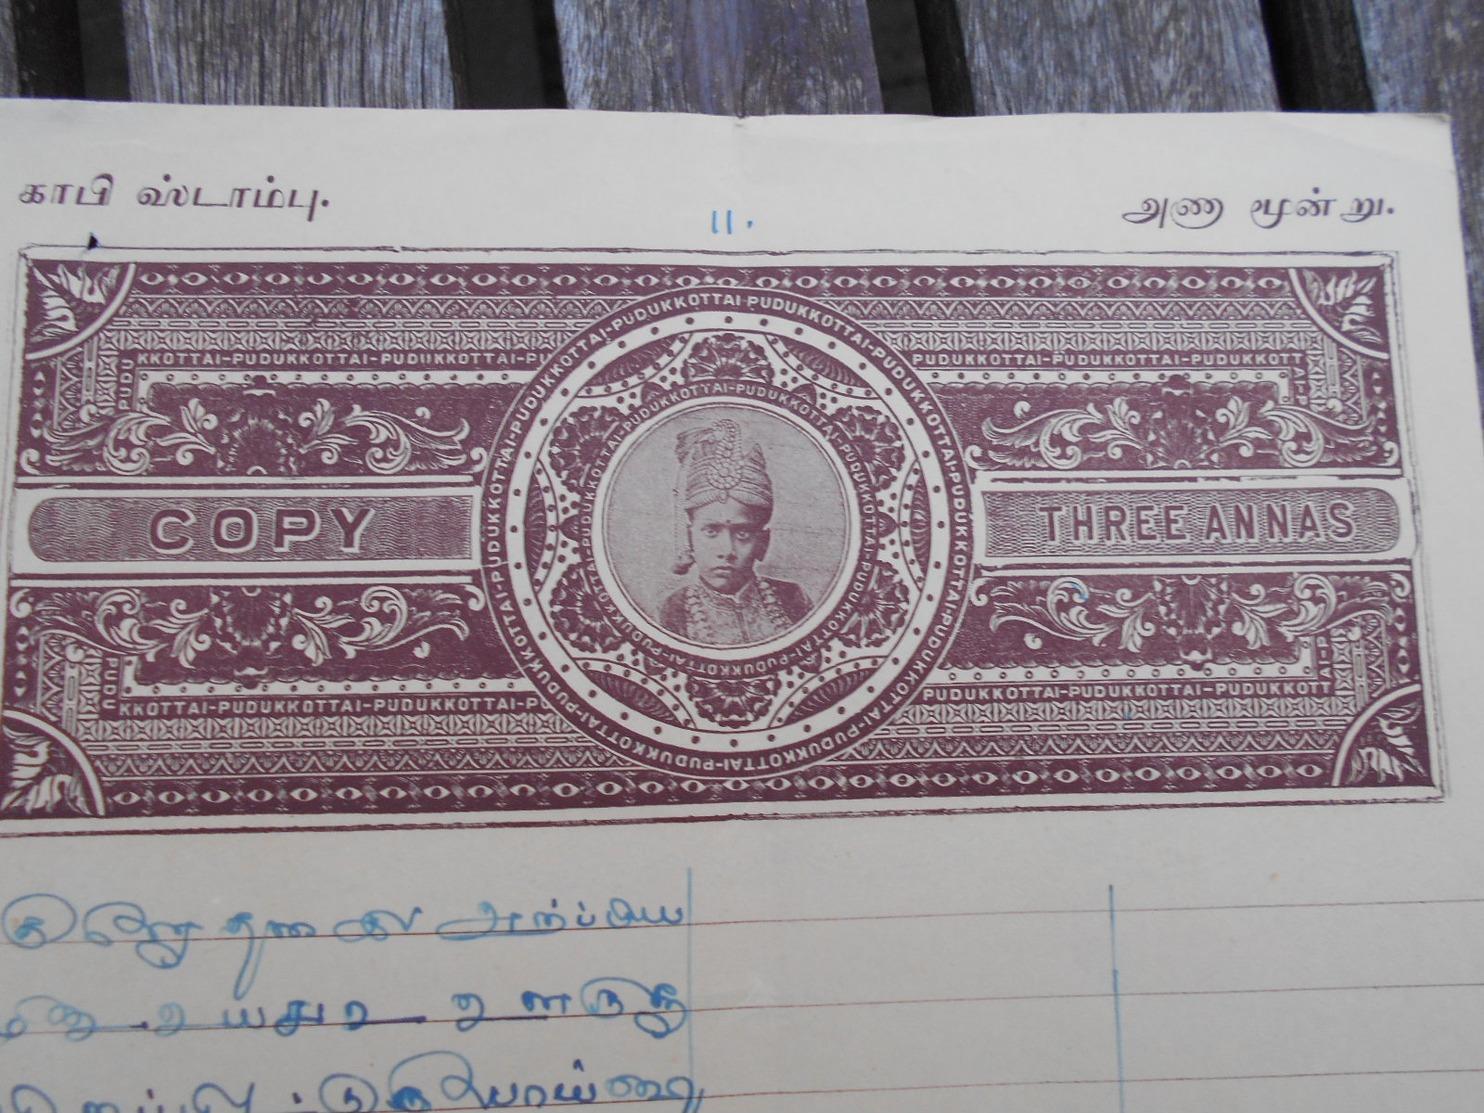 PUDUKKOTTA (Tamil Nadu) State Large Fiscal Document (202) - India